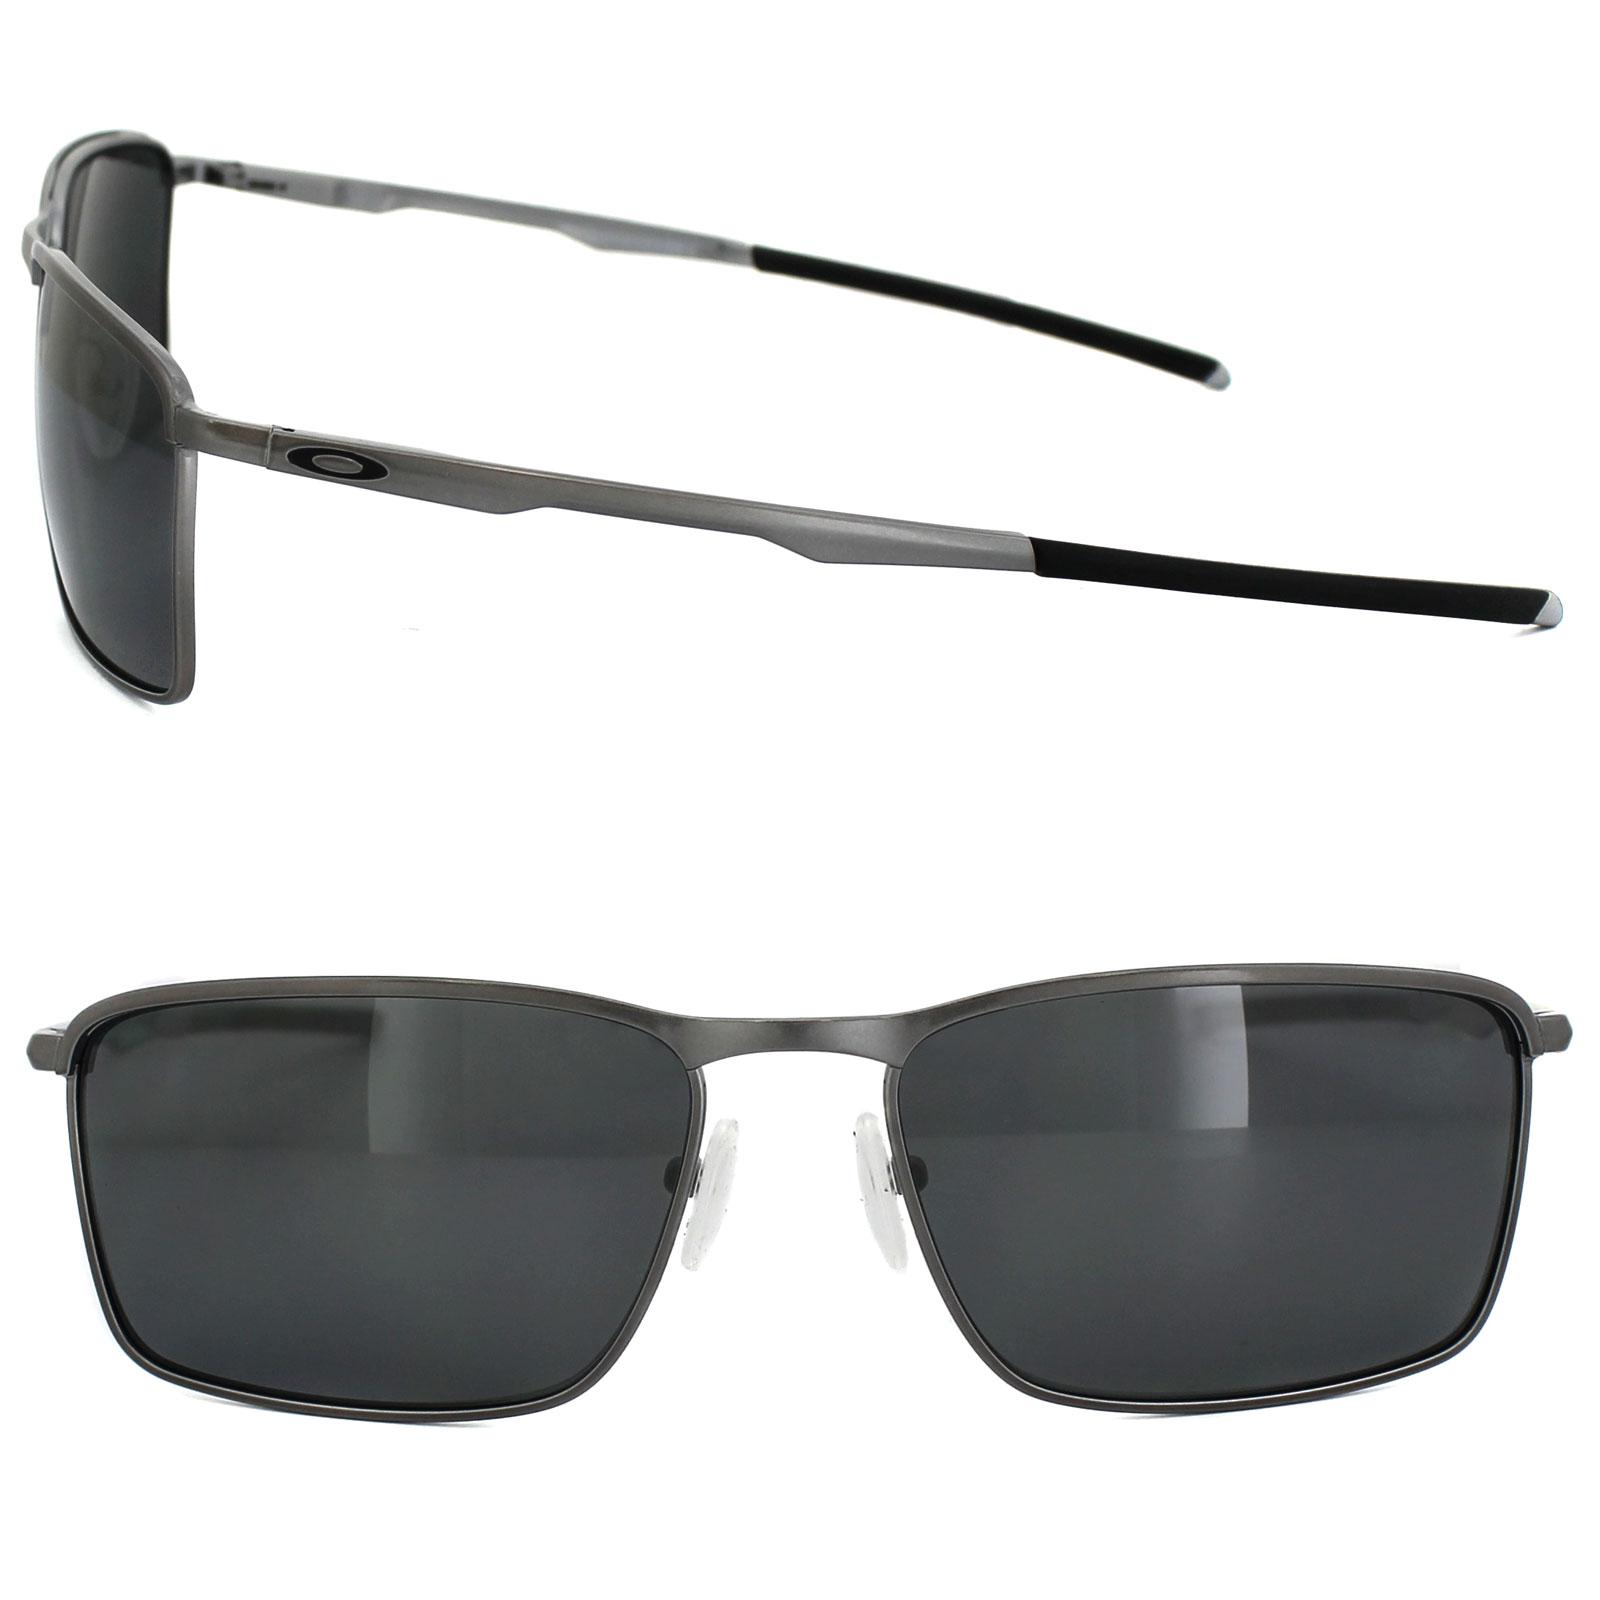 7166b43aef Oakley Conductor 6 Sunglasses Reviews « Heritage Malta